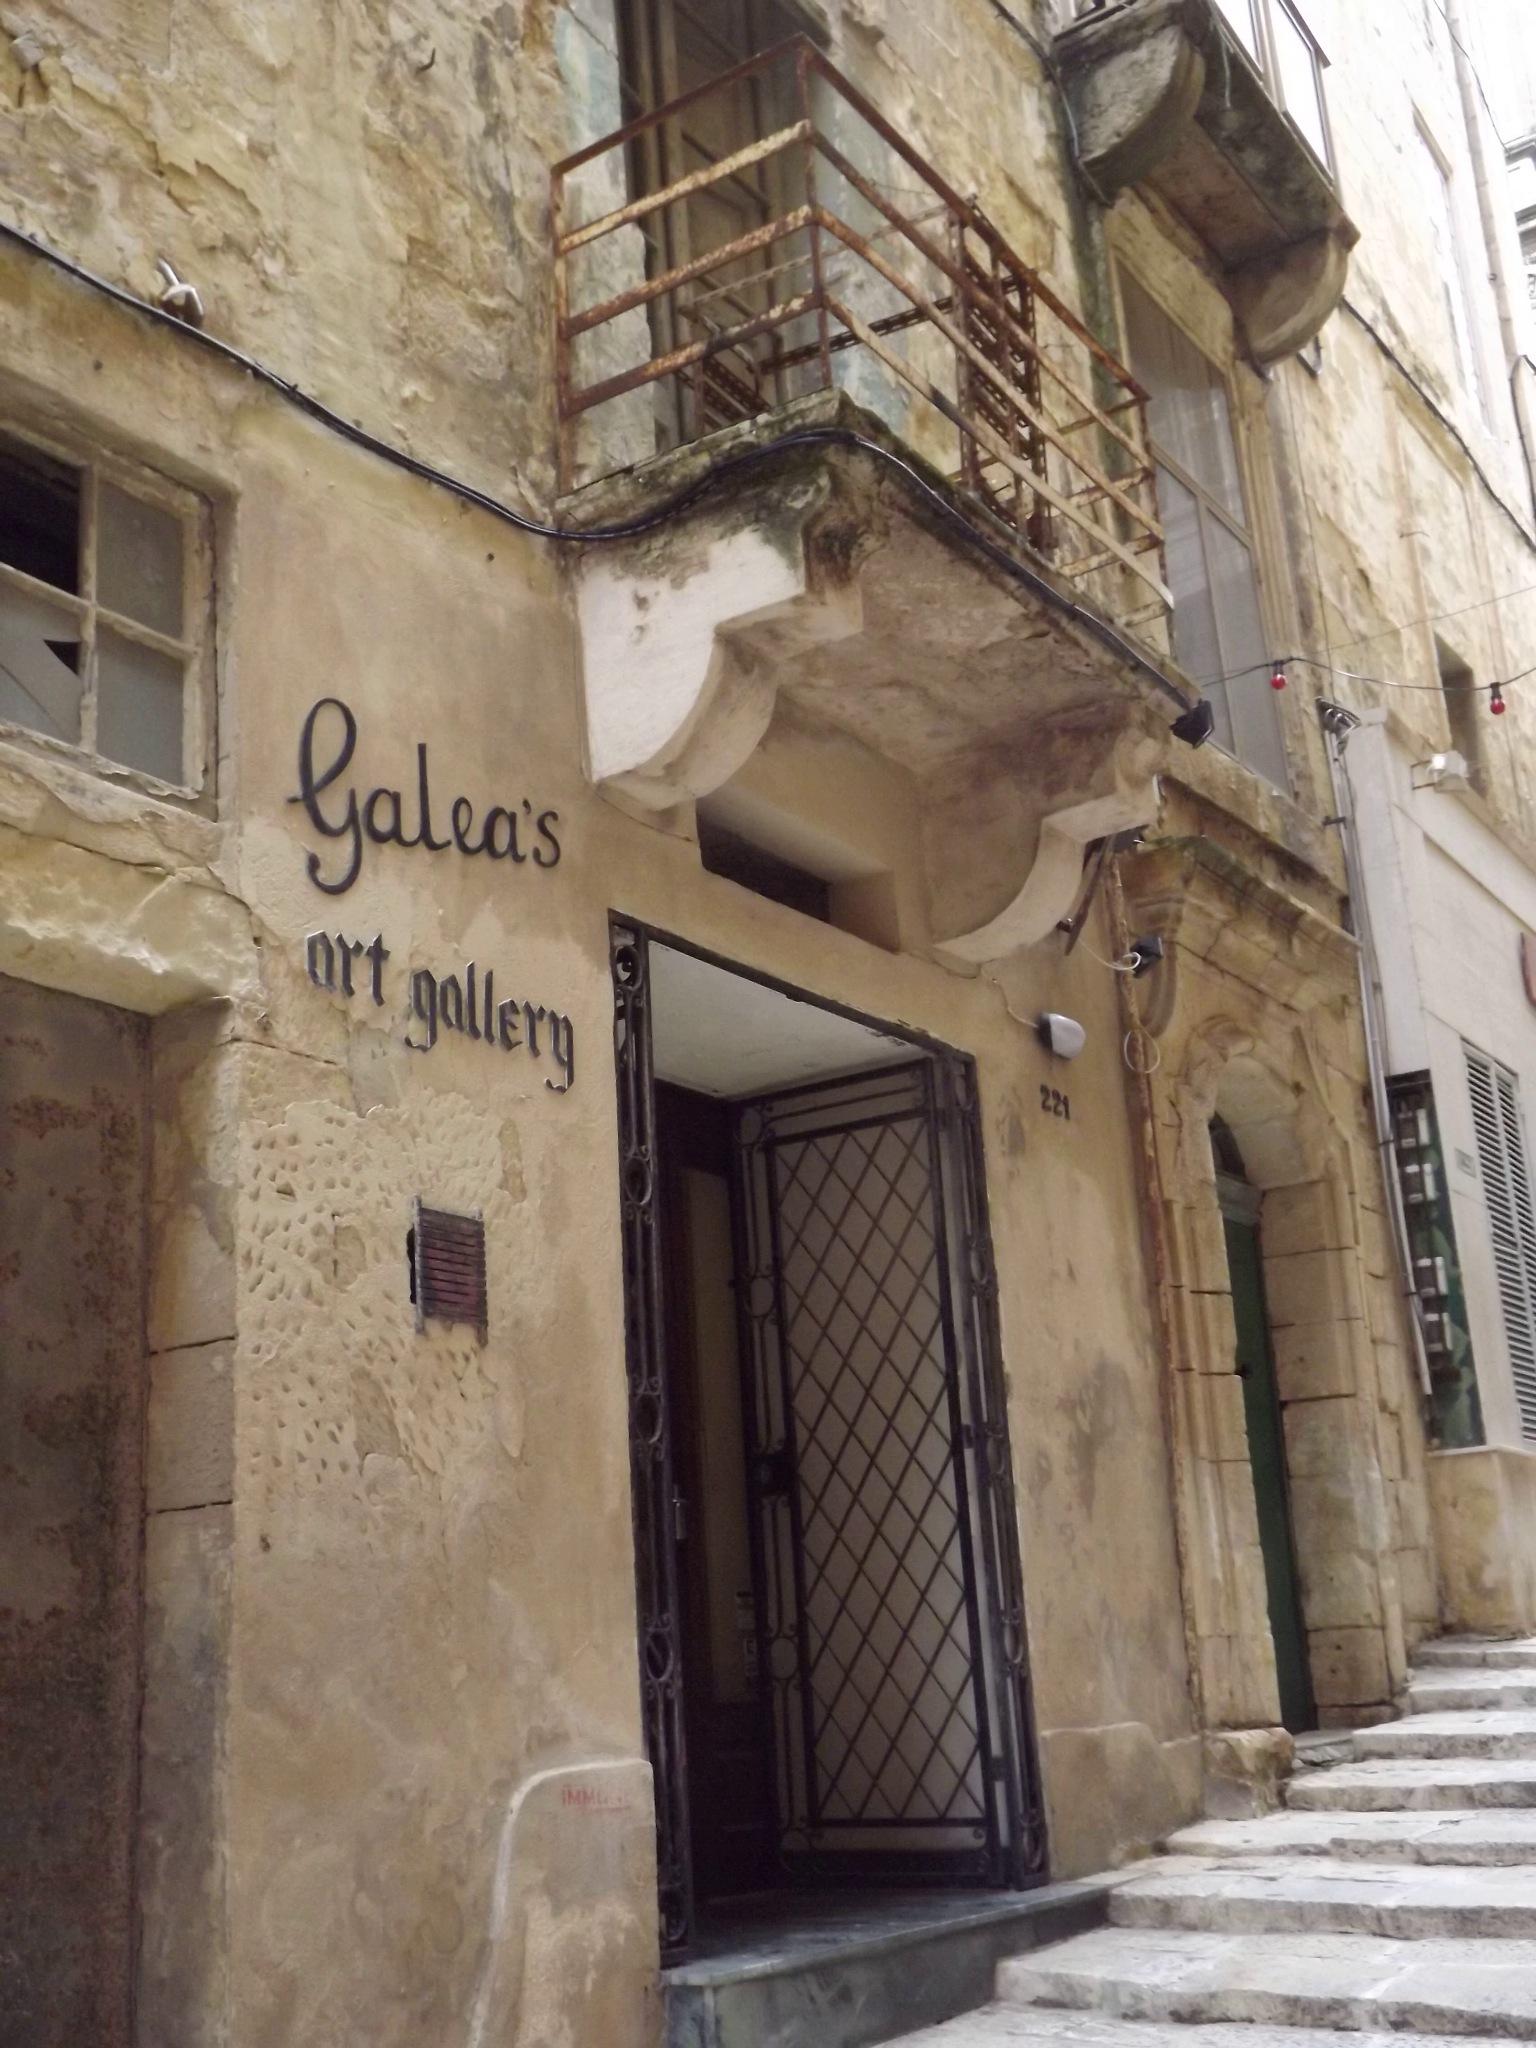 Art Galleries by Jorge Giro